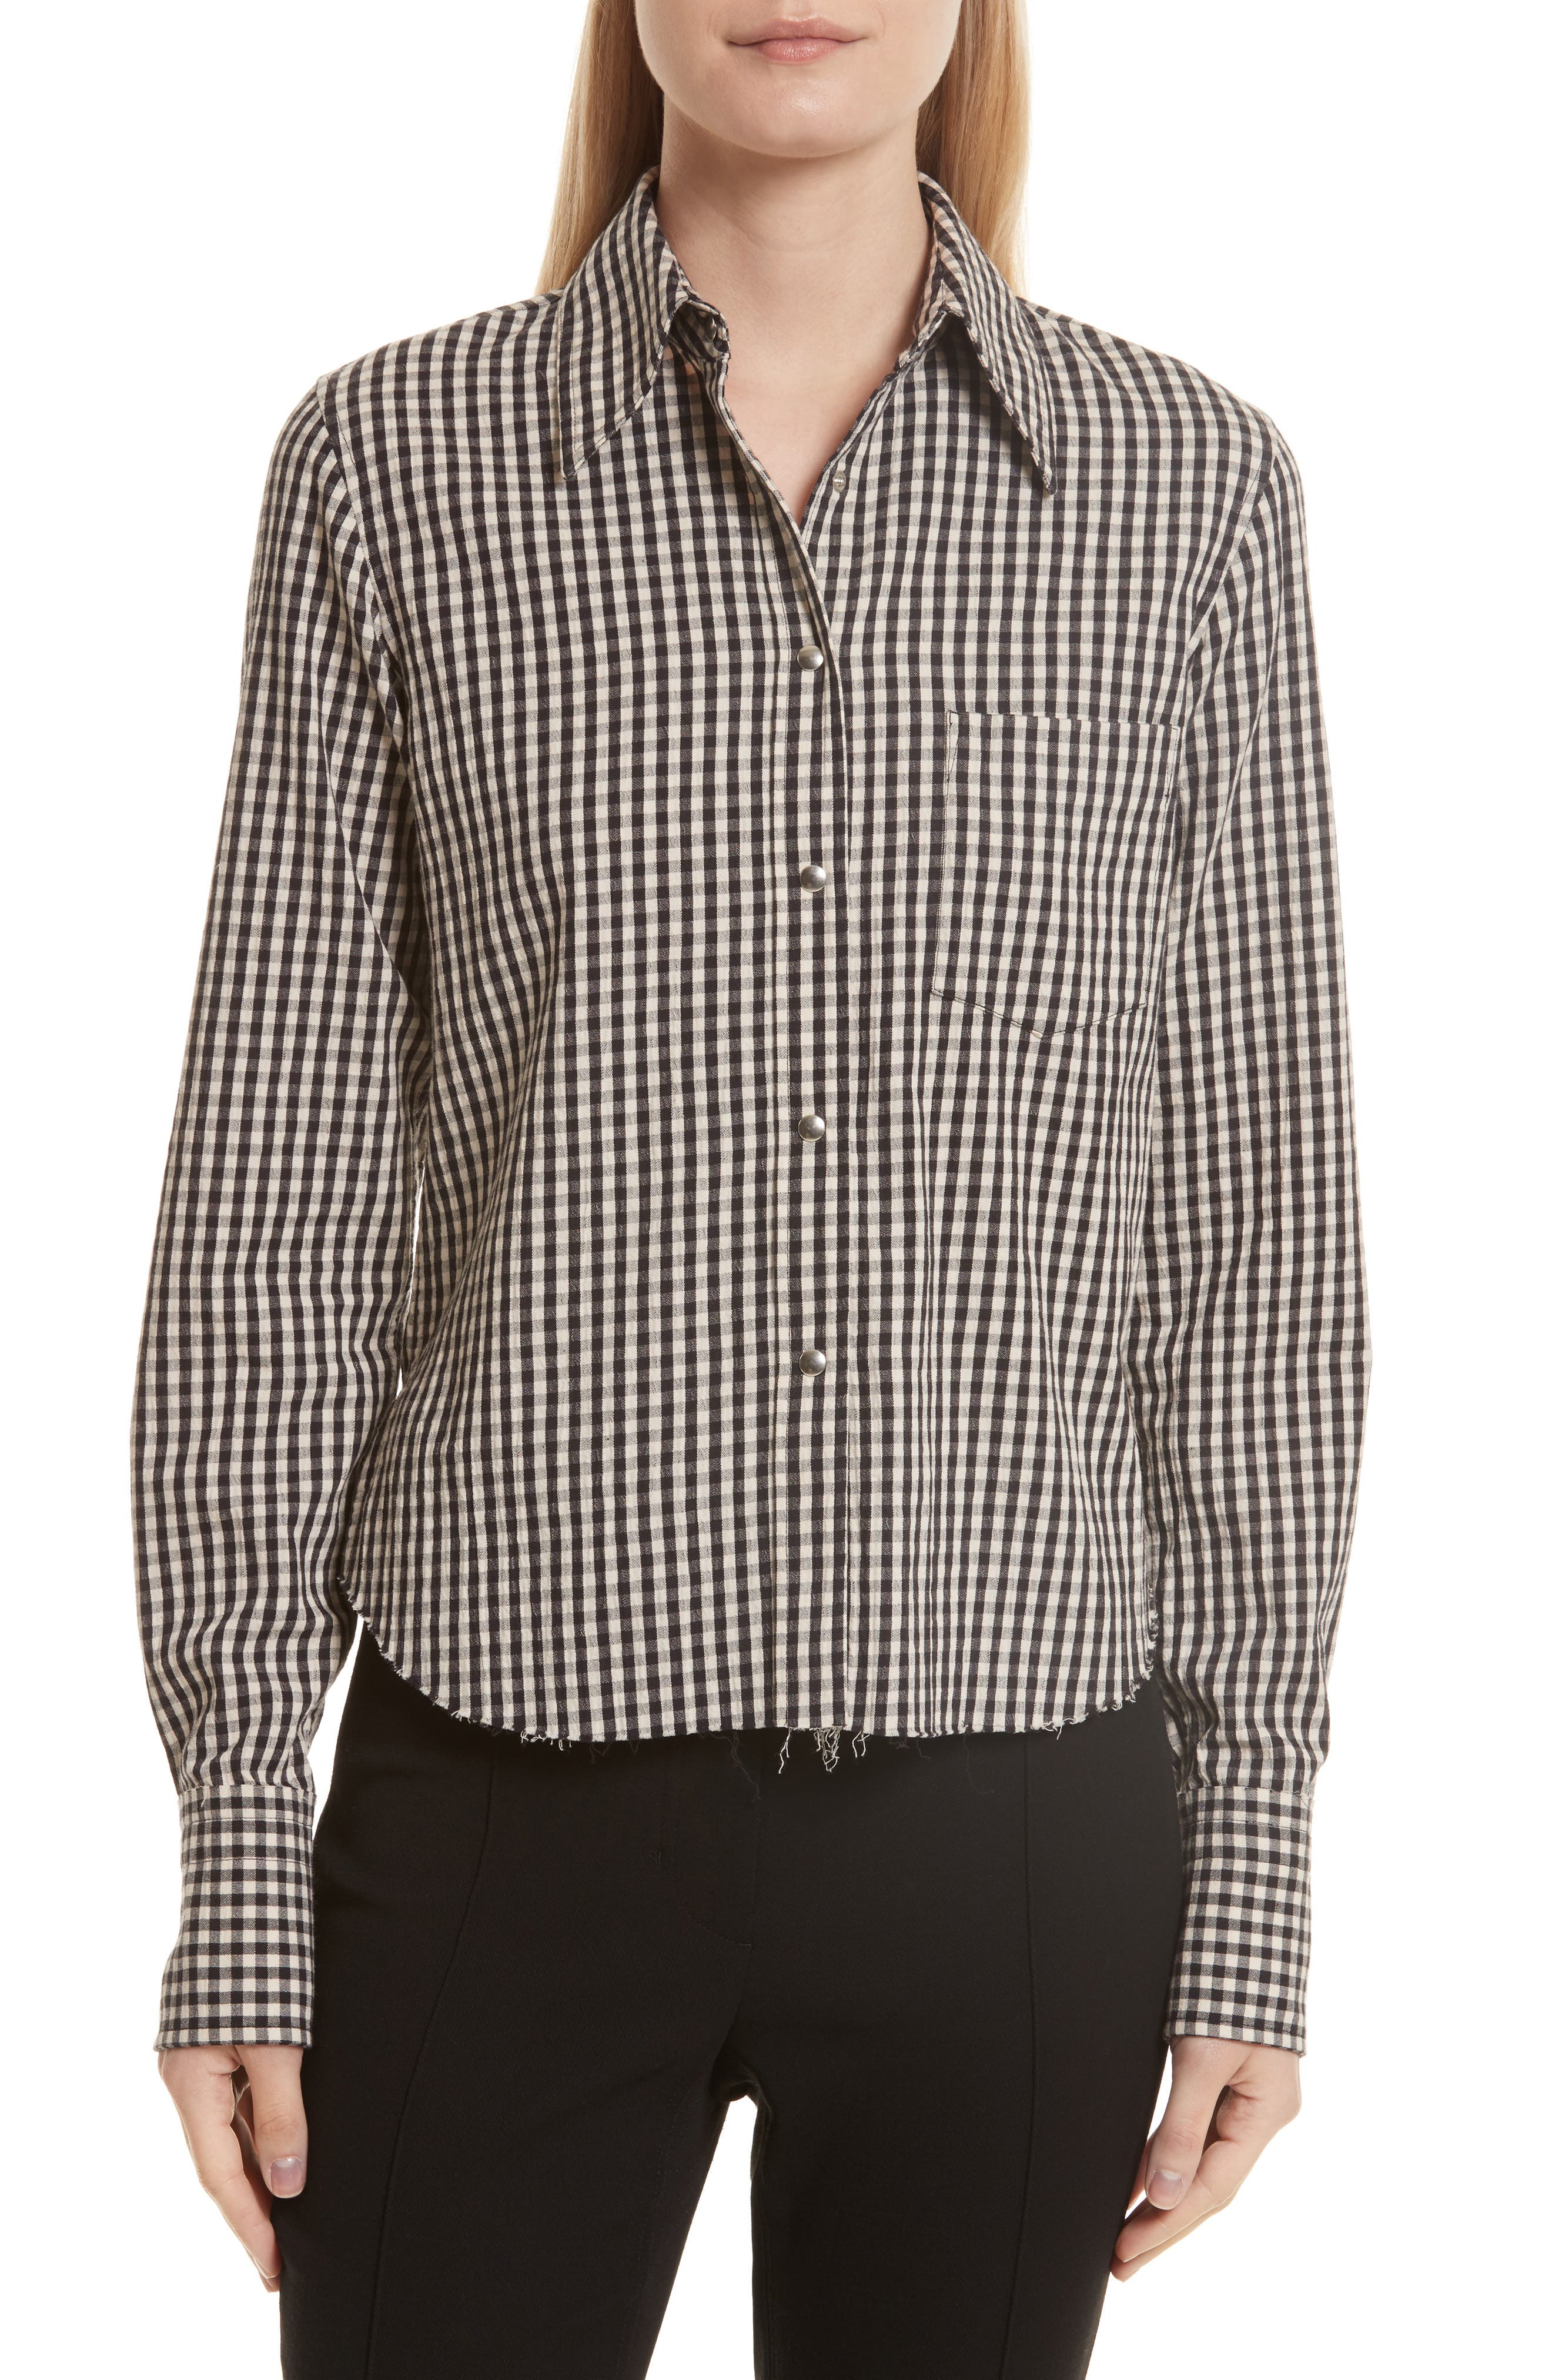 Alternate Image 1 Selected - Helmut Lang Gingham Check Shirt